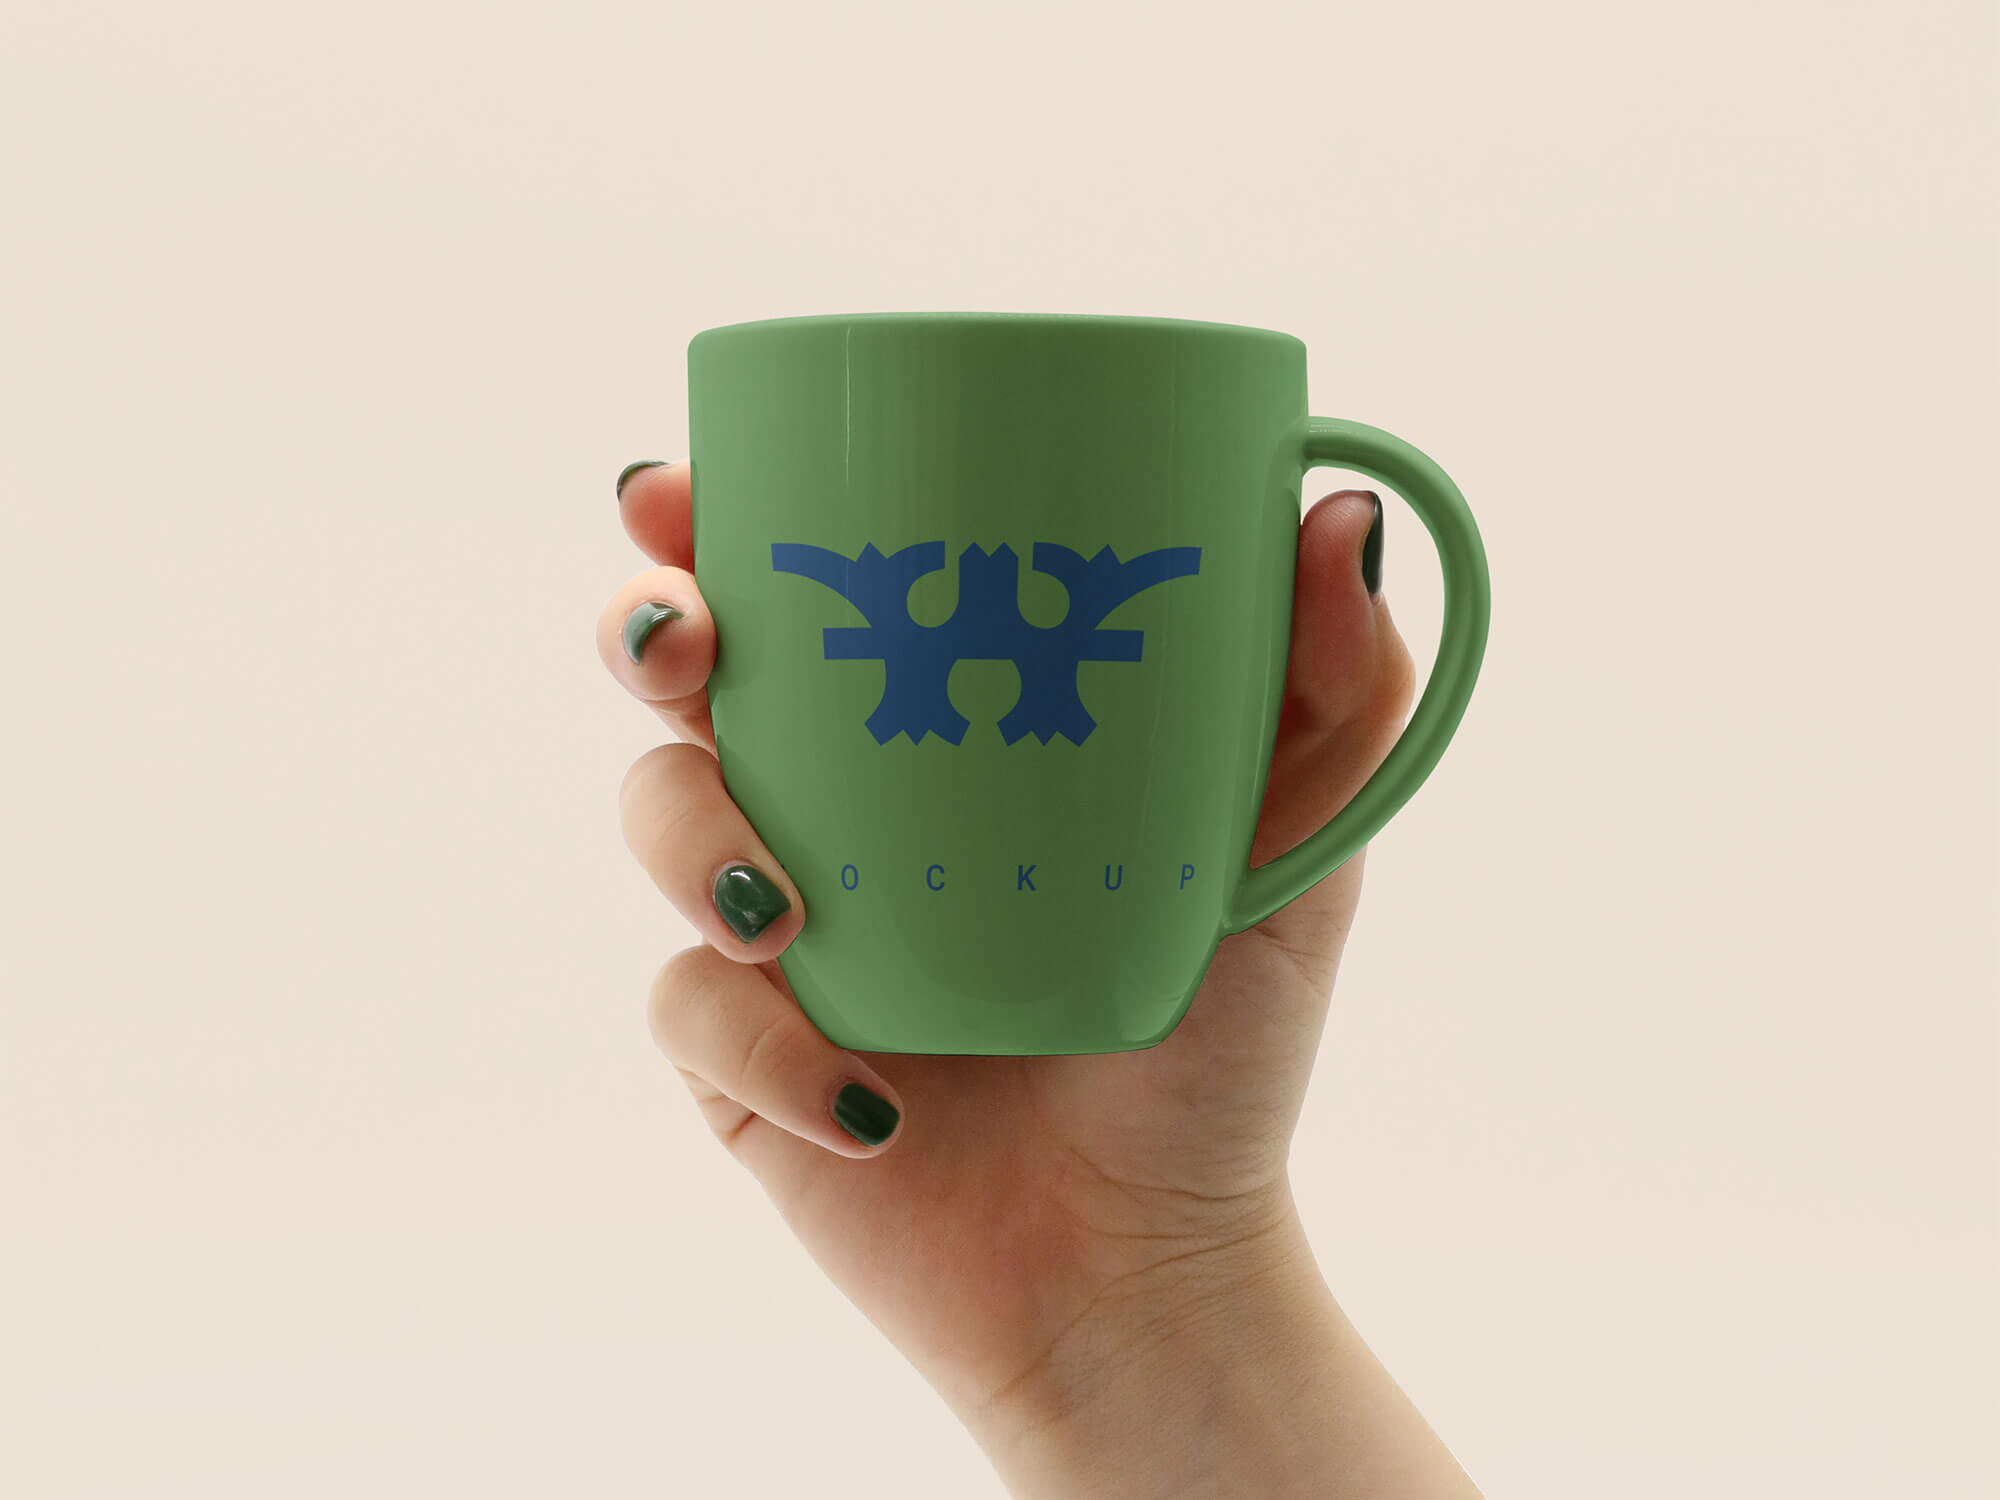 Free-Hand-Holding-Mug-Mockup-PSD